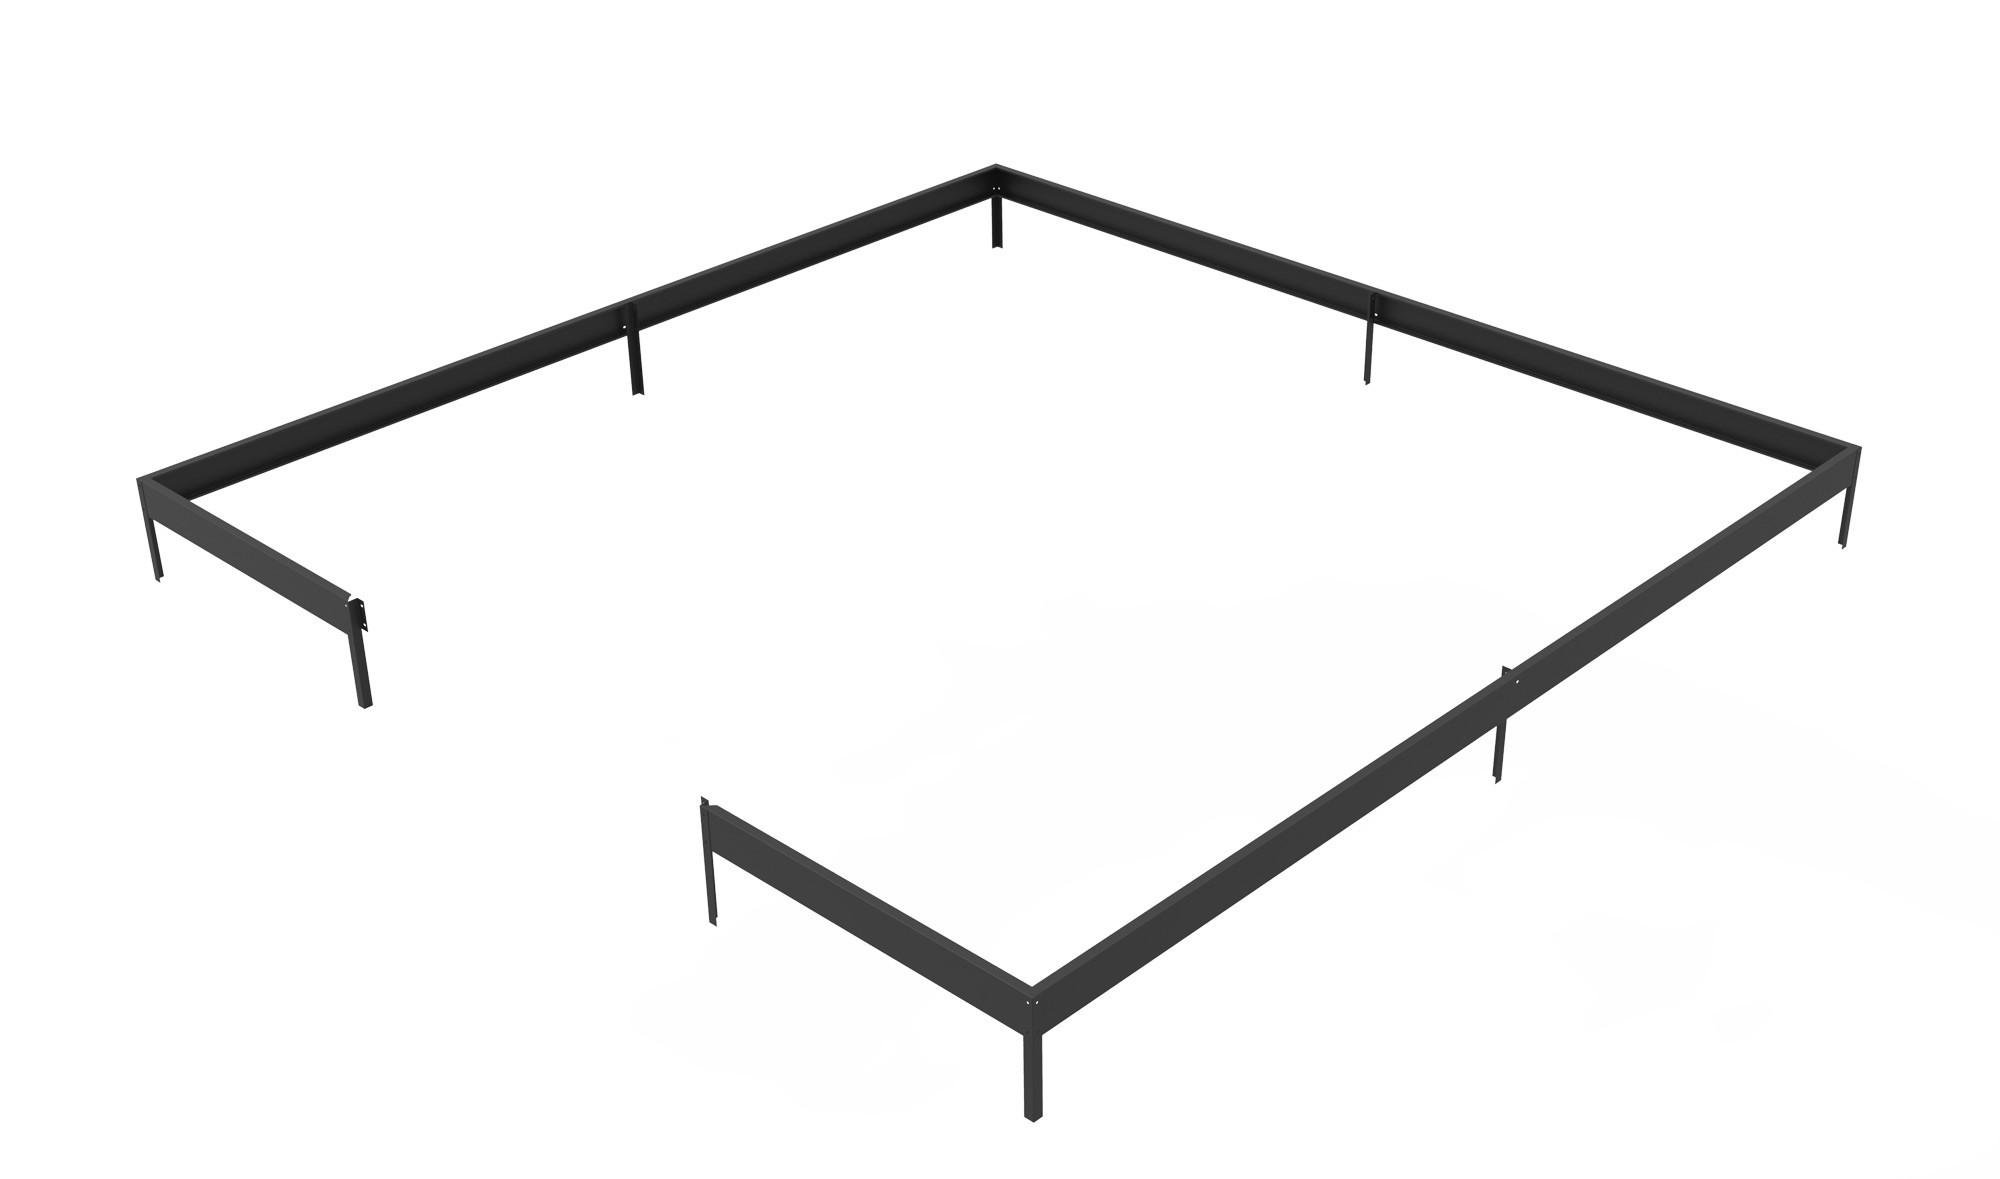 juliana fundament f r juliana gew chshaus oase 13 5 m schwarz bei. Black Bedroom Furniture Sets. Home Design Ideas